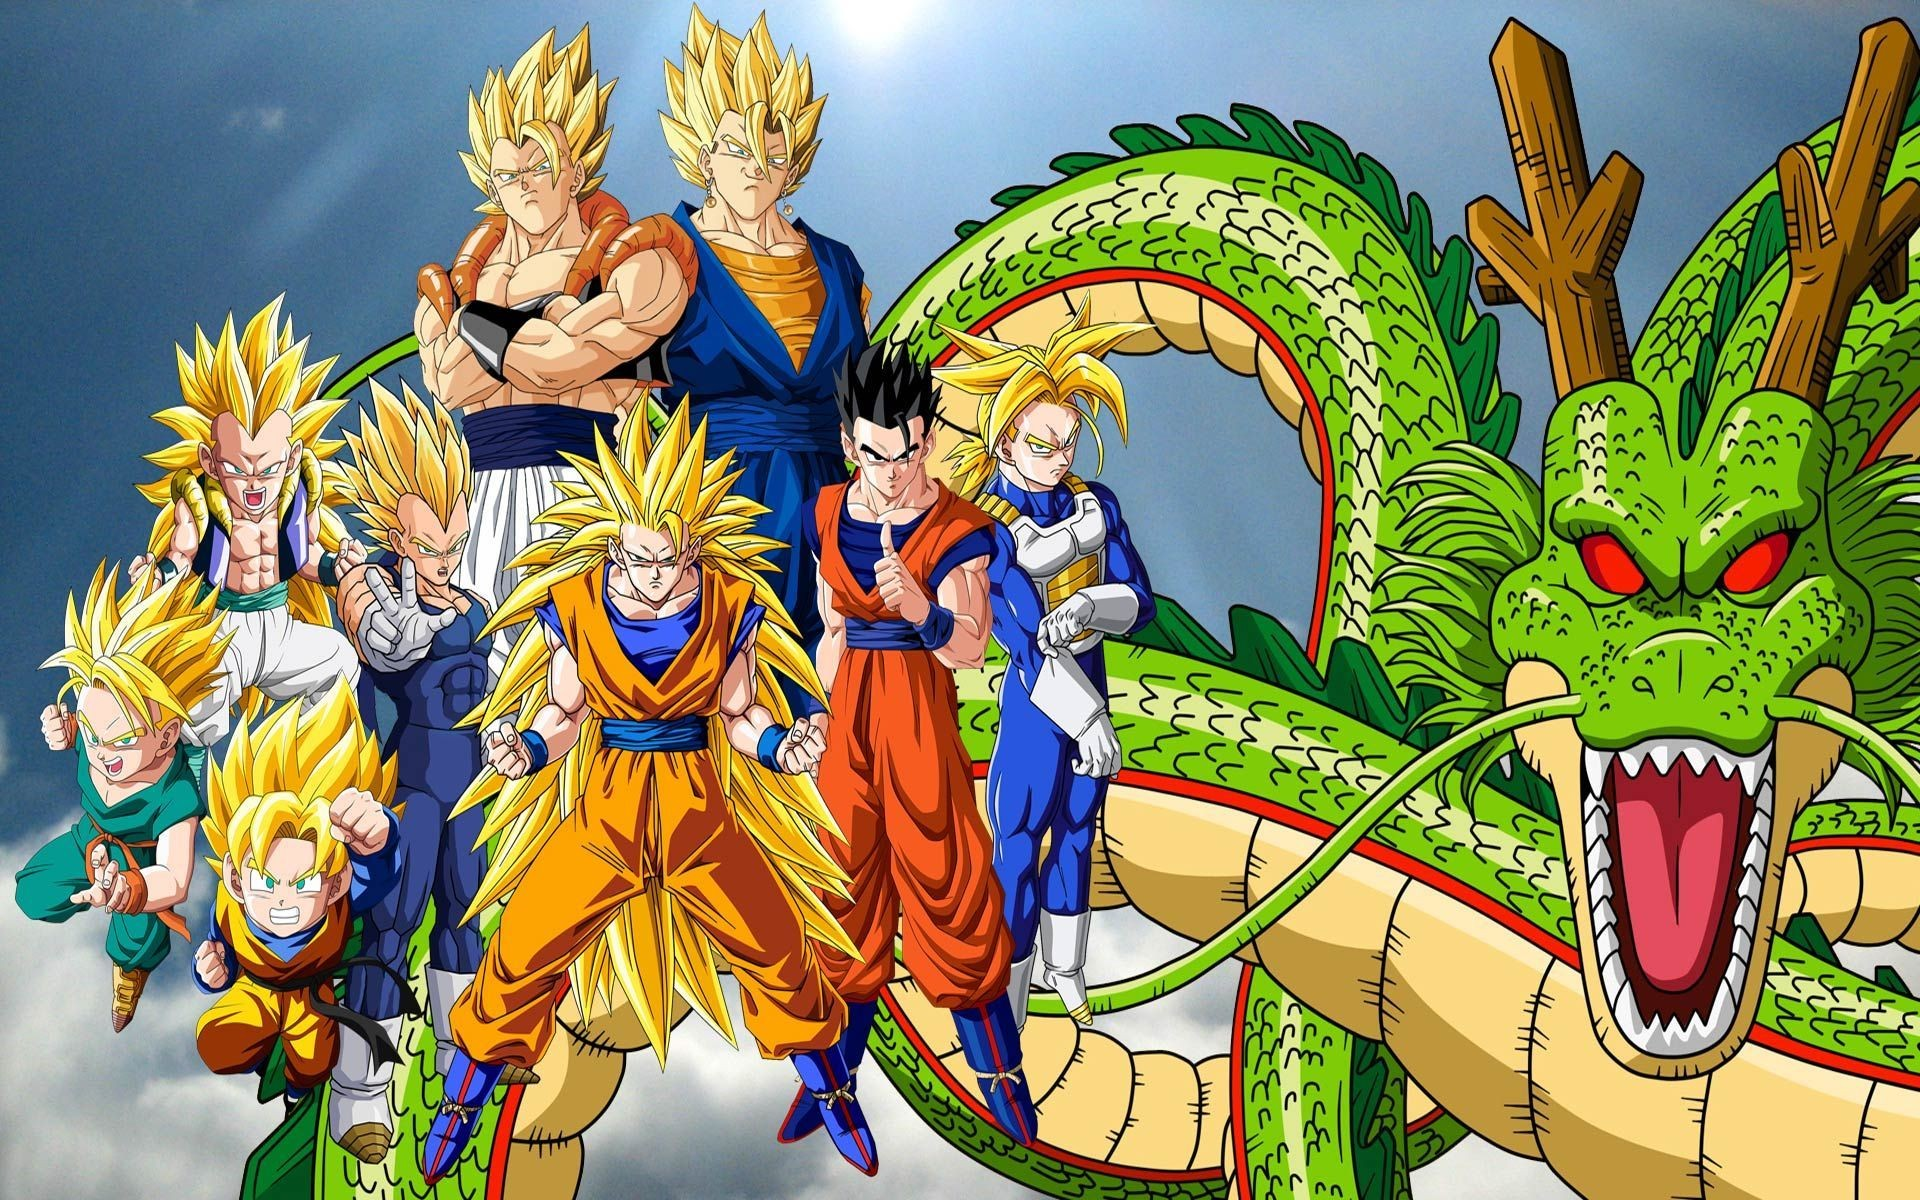 Dragon Ball Z Wallpaper Download Free Amazing High Resolution